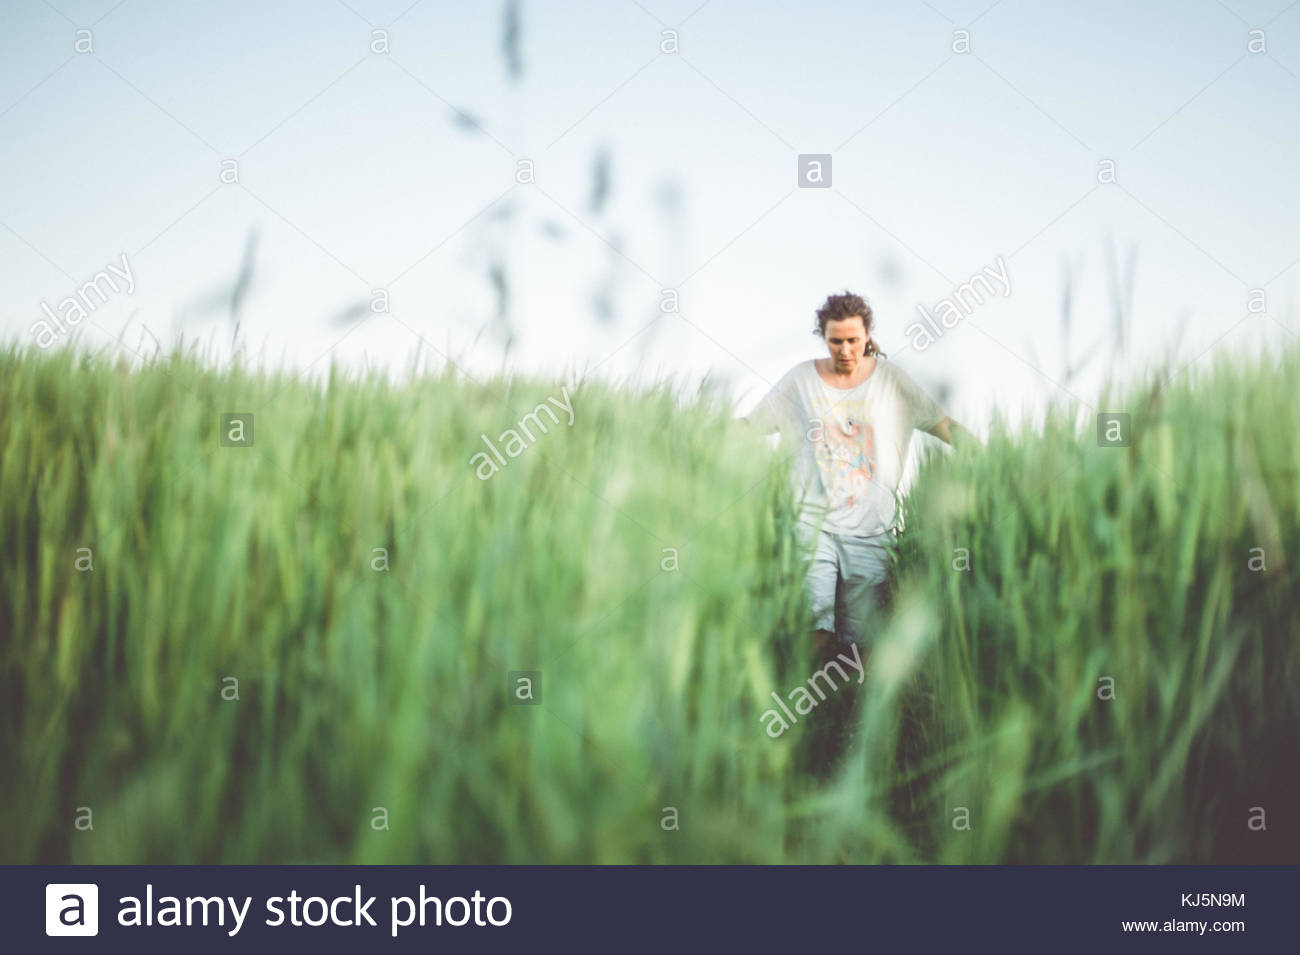 Man walking through green field Stock Photo